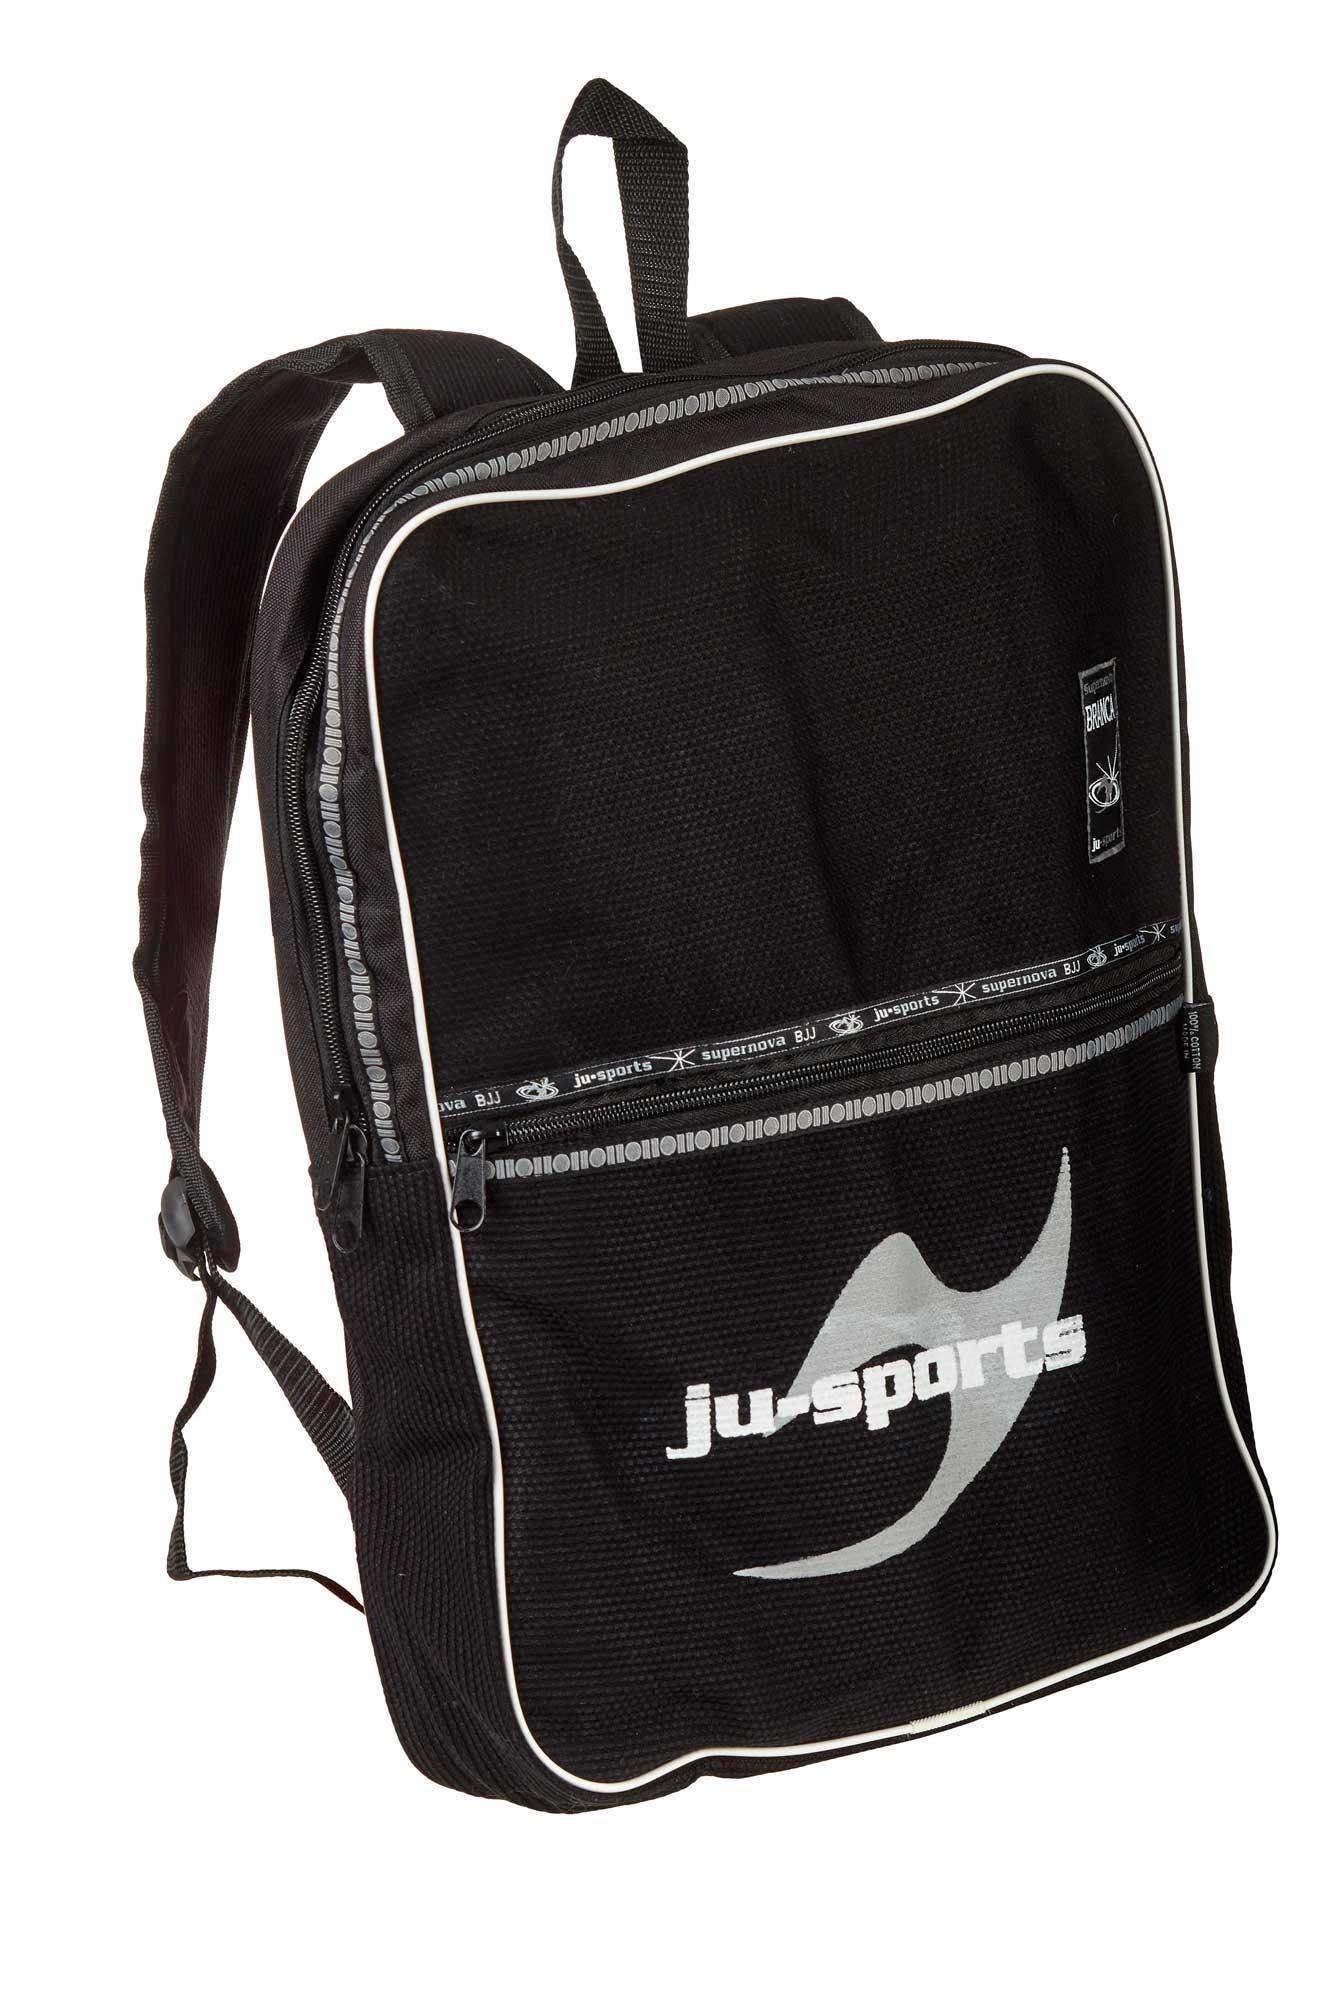 9243000-Supernova-White-Branca-BJJ-Gi-Ju-Jutsu-d7